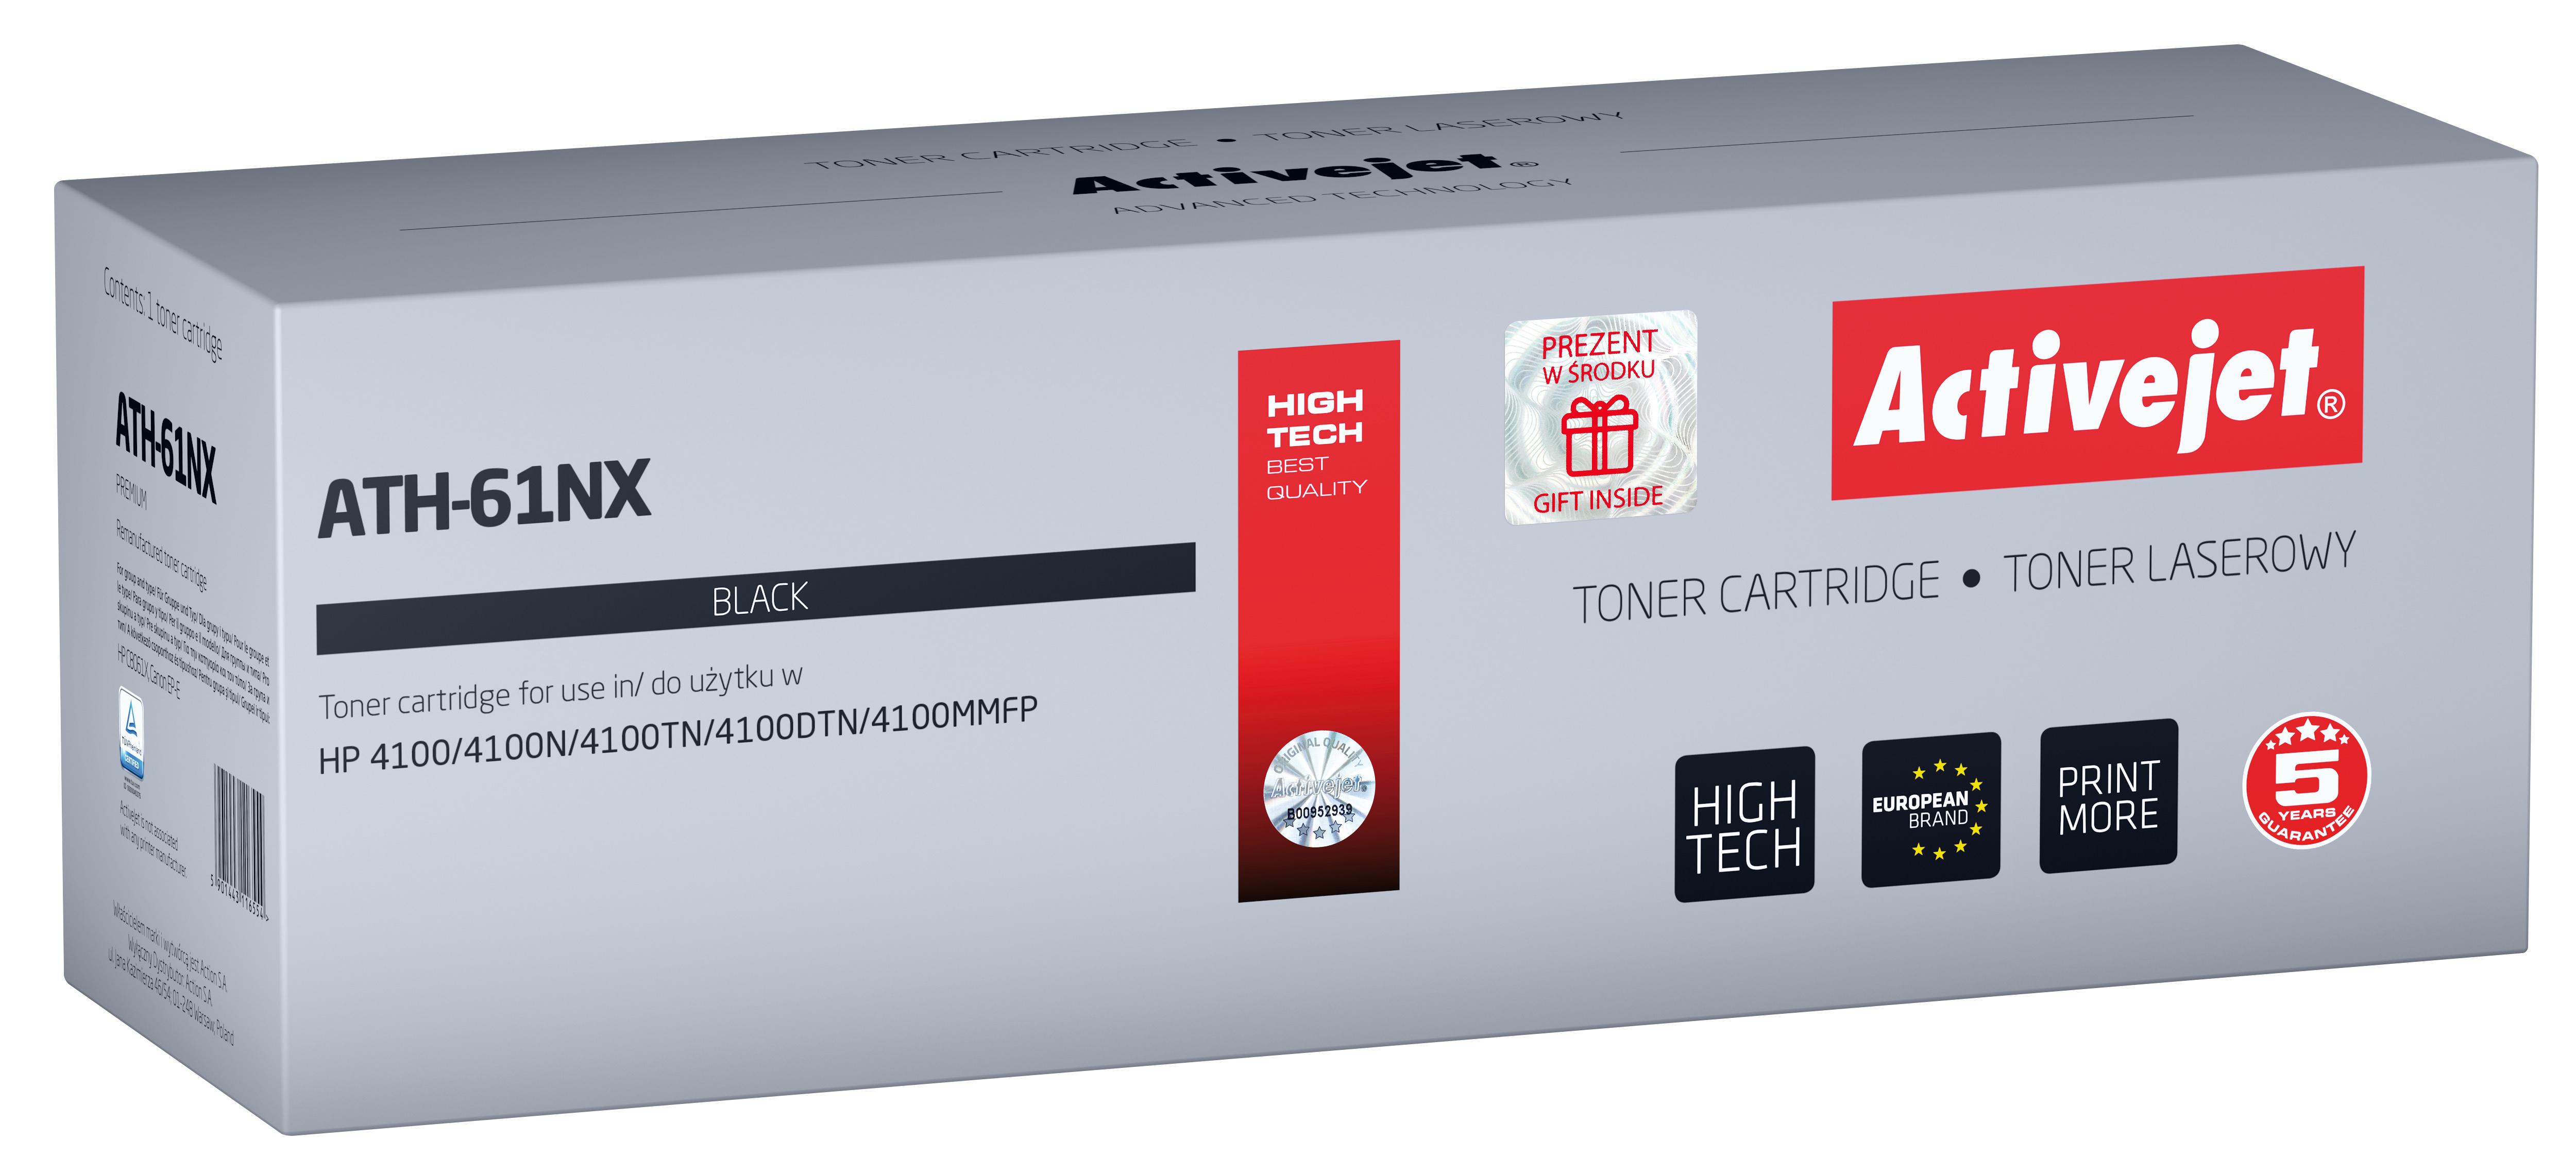 Toner Activejet ATH-61NX do drukarek HP; Zamiennik HP 61X C8061X; Supreme; 10000 stron; black